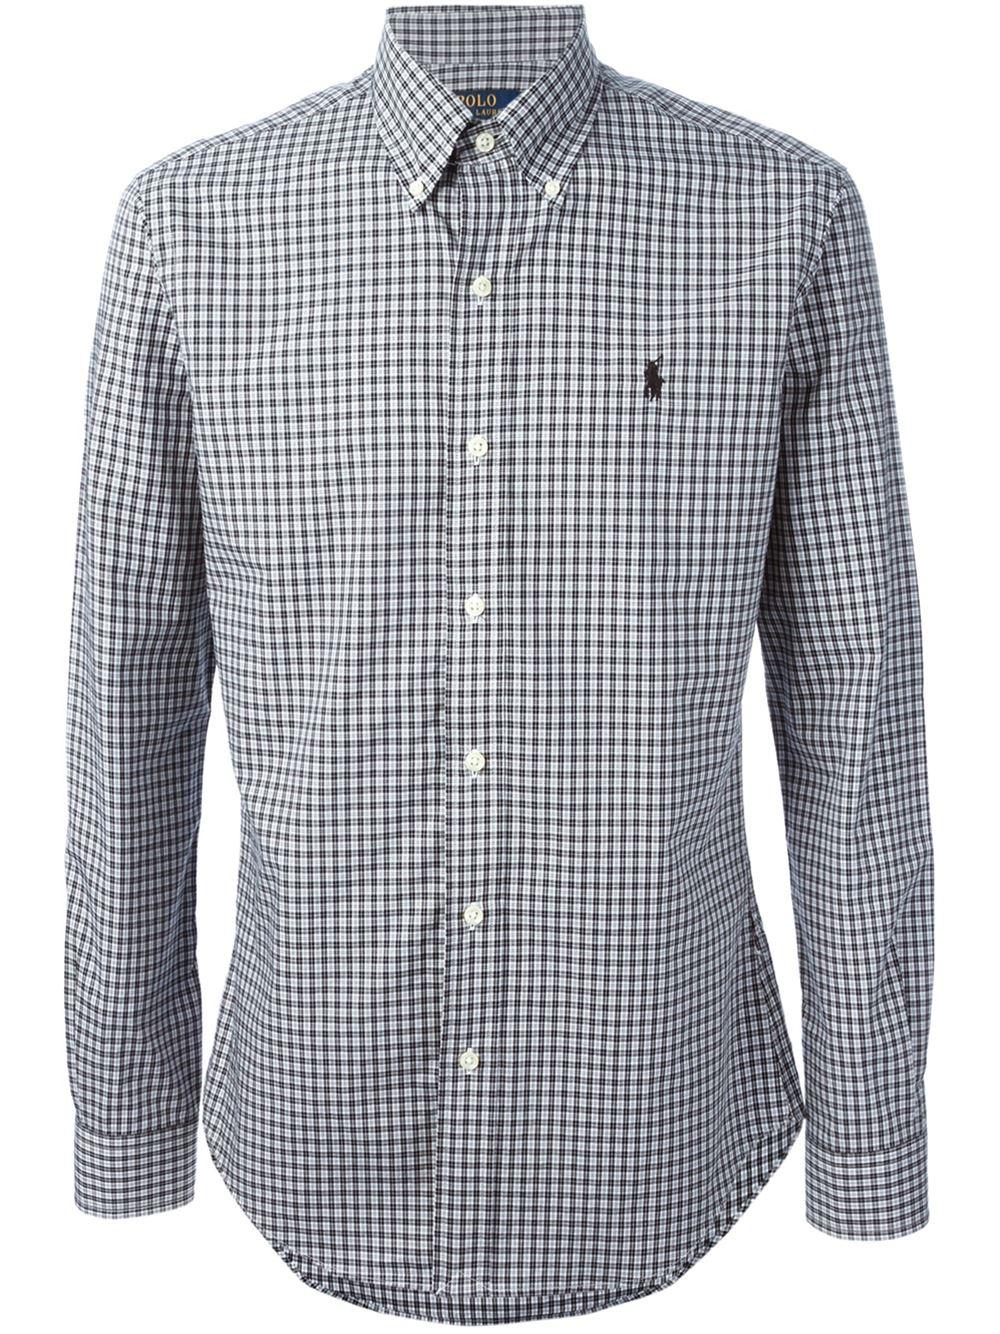 black polo button down shirt